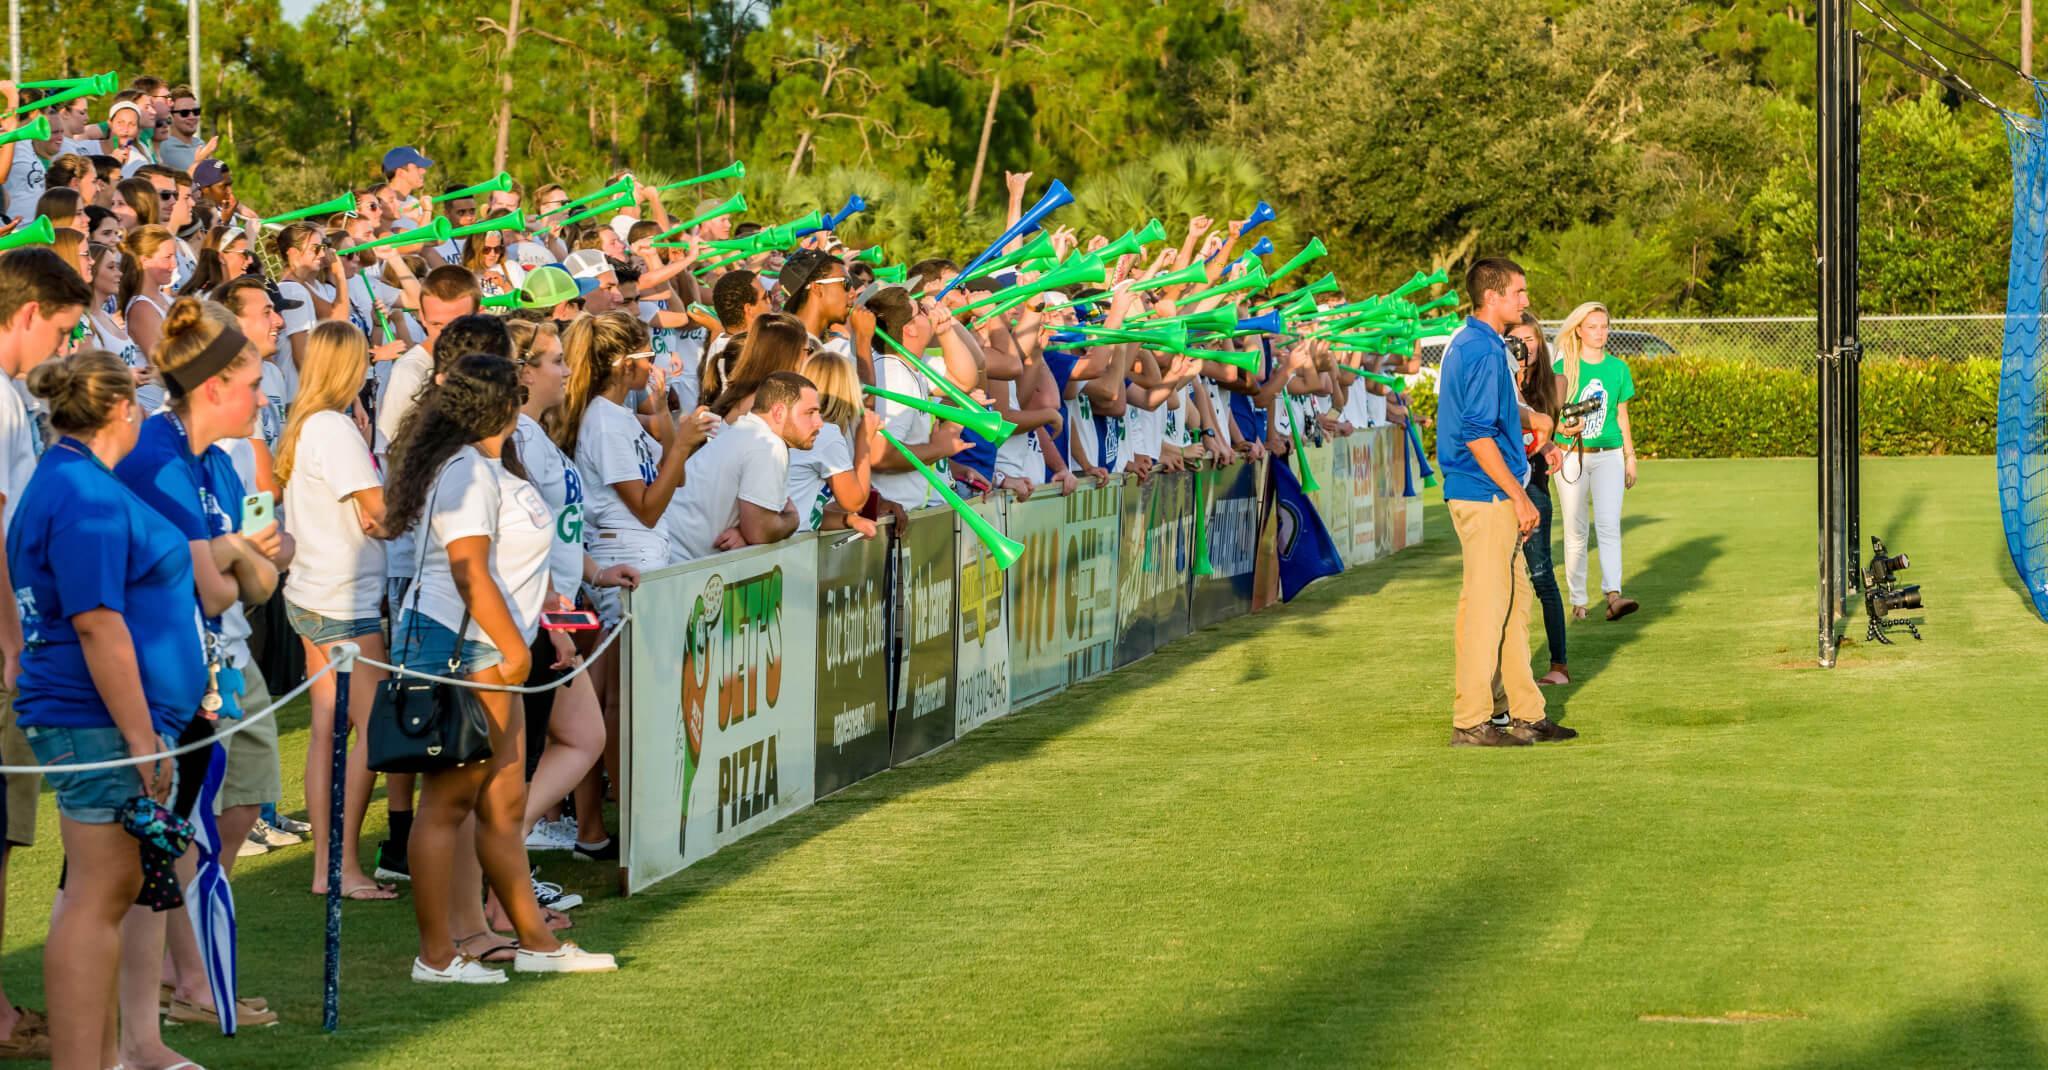 FGCU earns third A-Sun All-Sports Championship